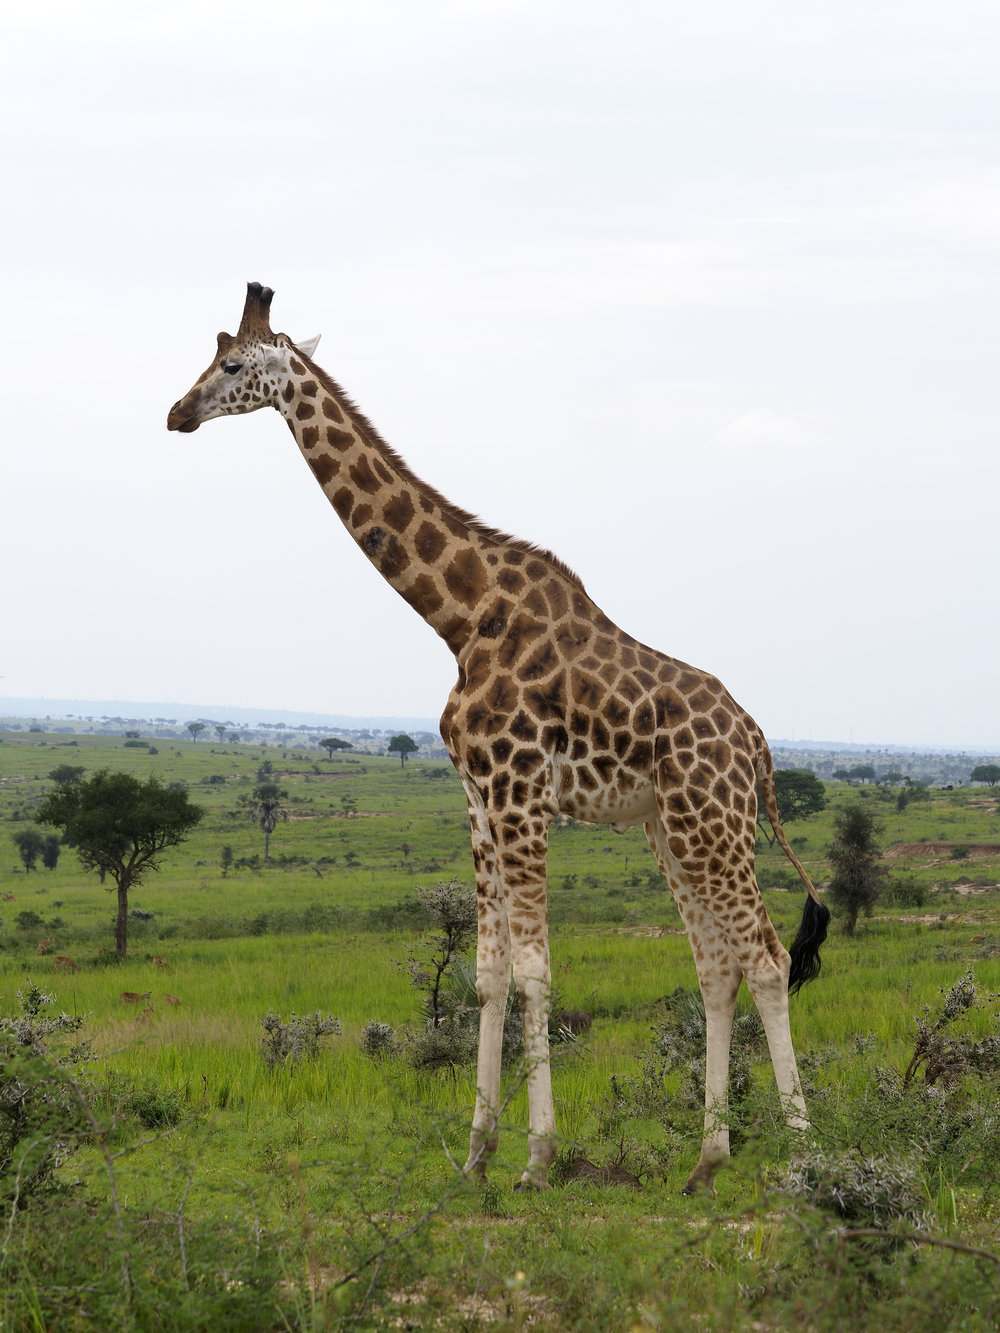 Rothchilds giraffe, Giraffa camelopardalis rothschildi